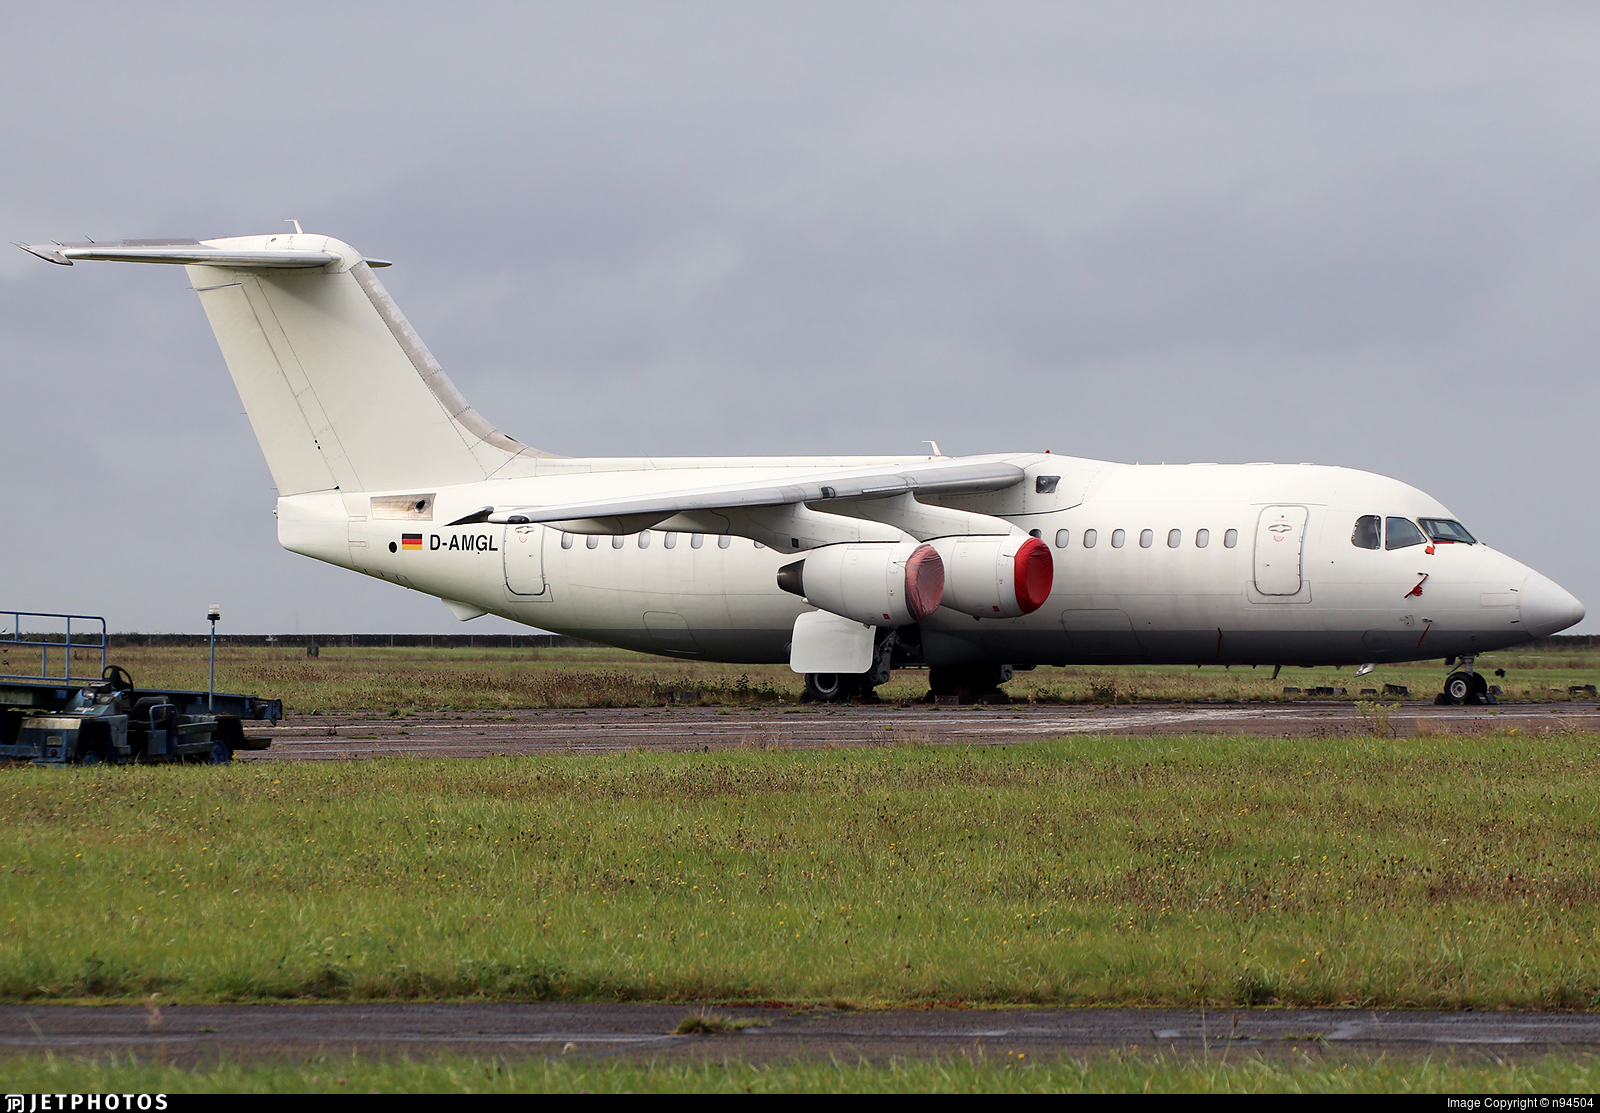 D-AMGL - British Aerospace BAe 146-200 - Pionair